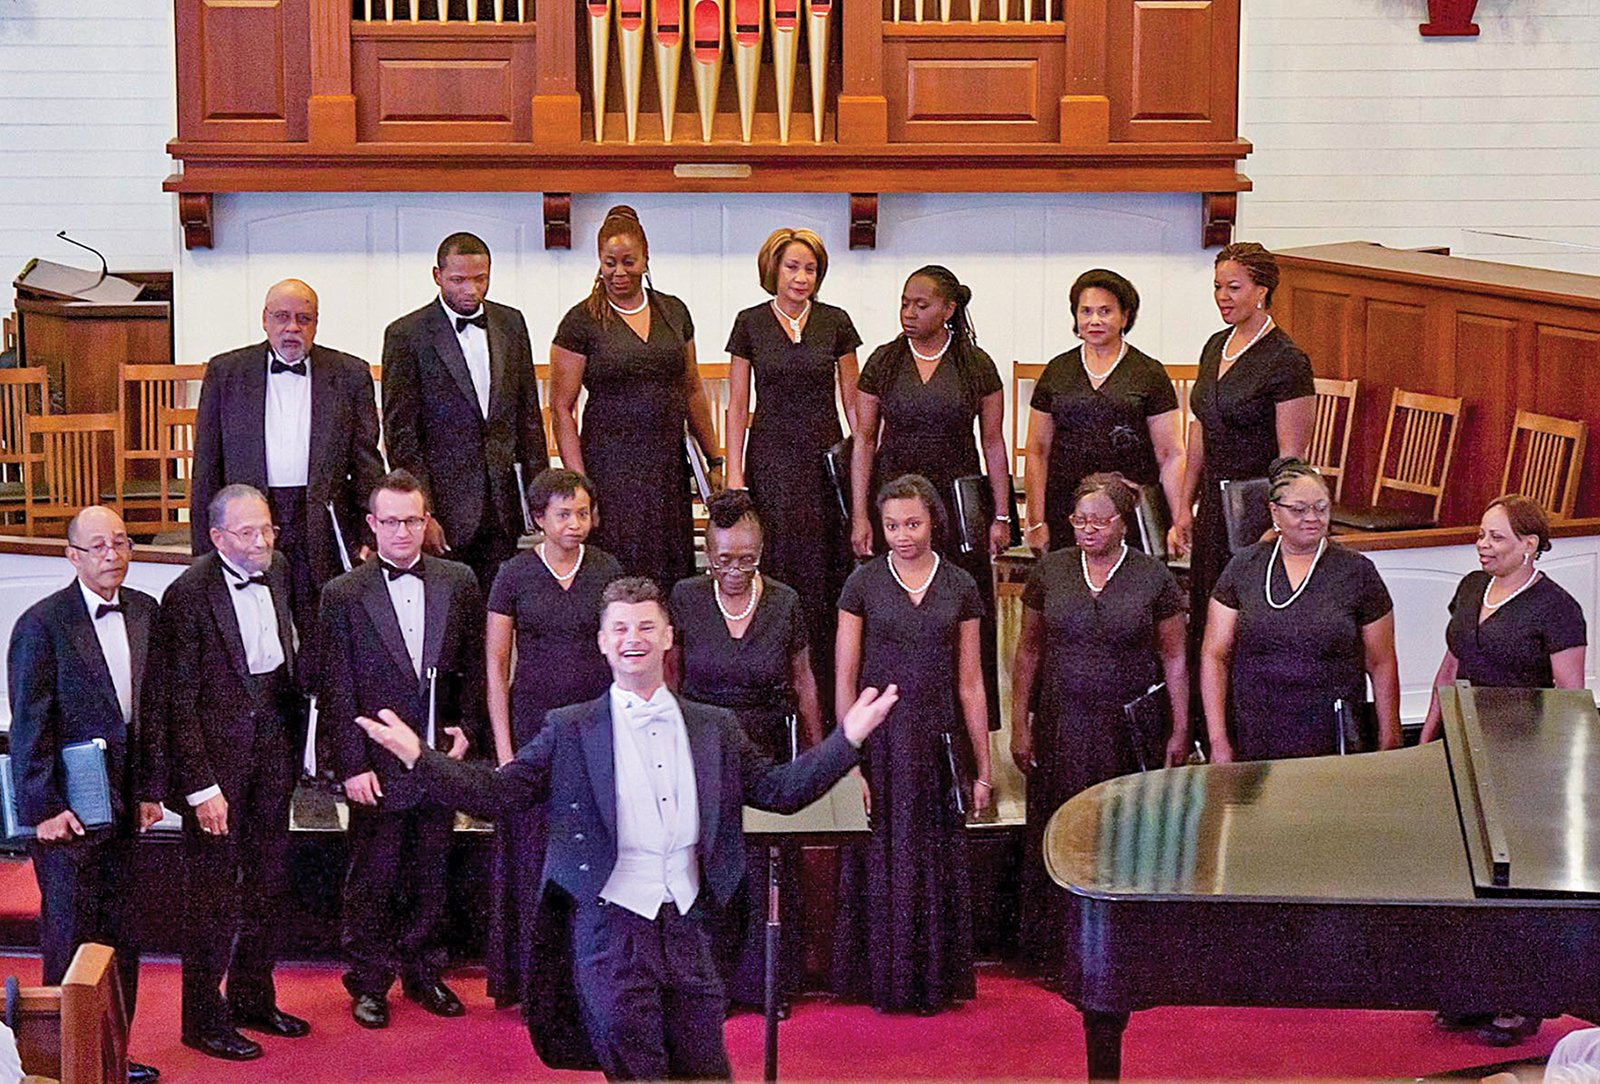 highlands nc interlude Trey Clegg Chamber Choir